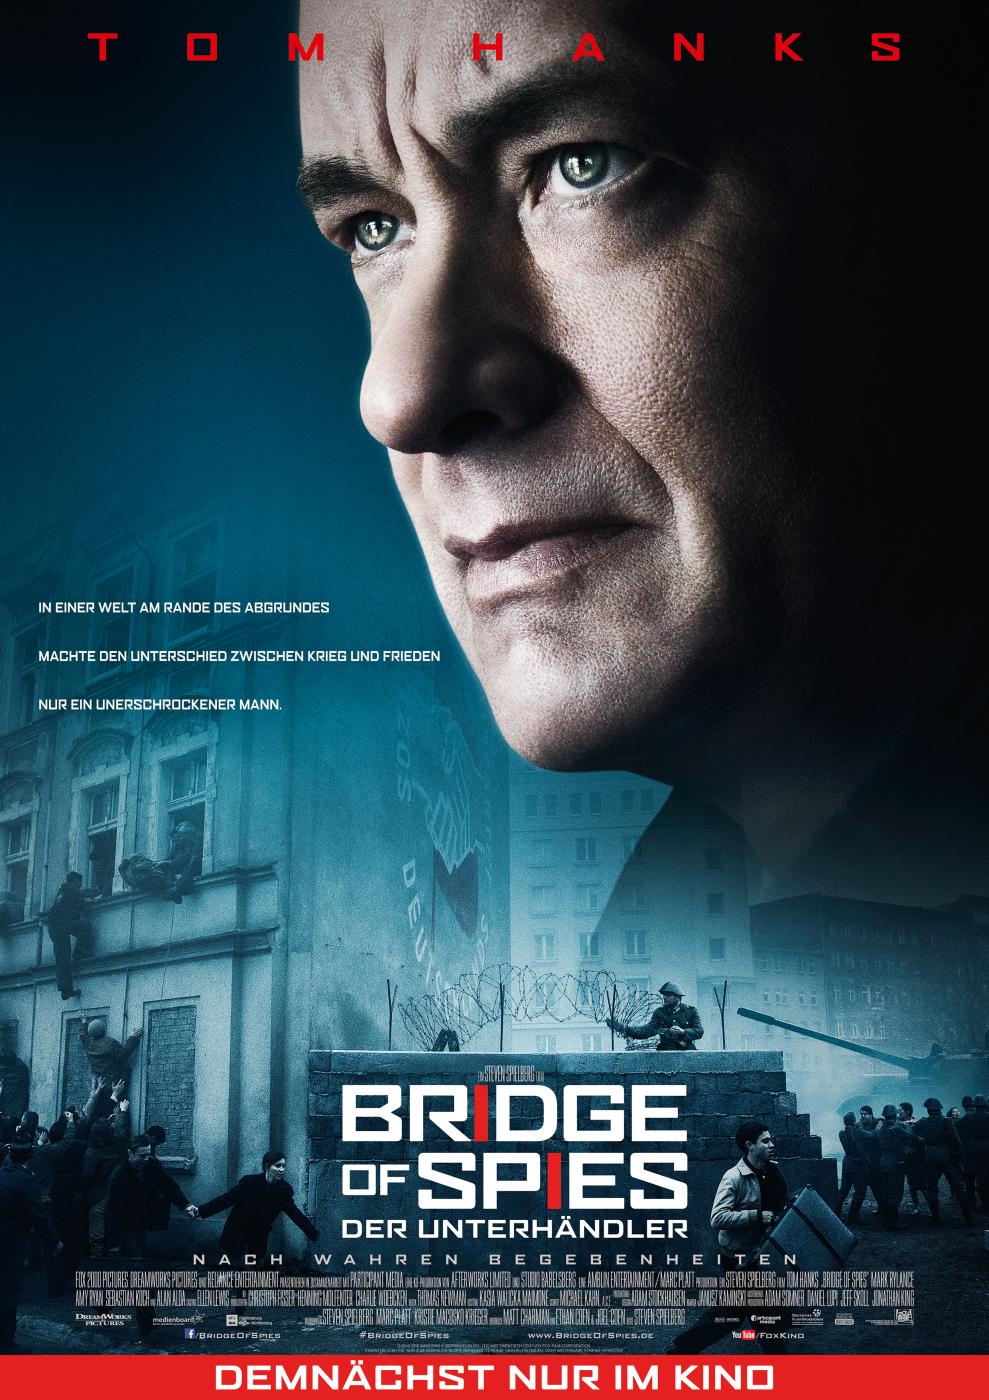 Bridge Of Spies Movie4k